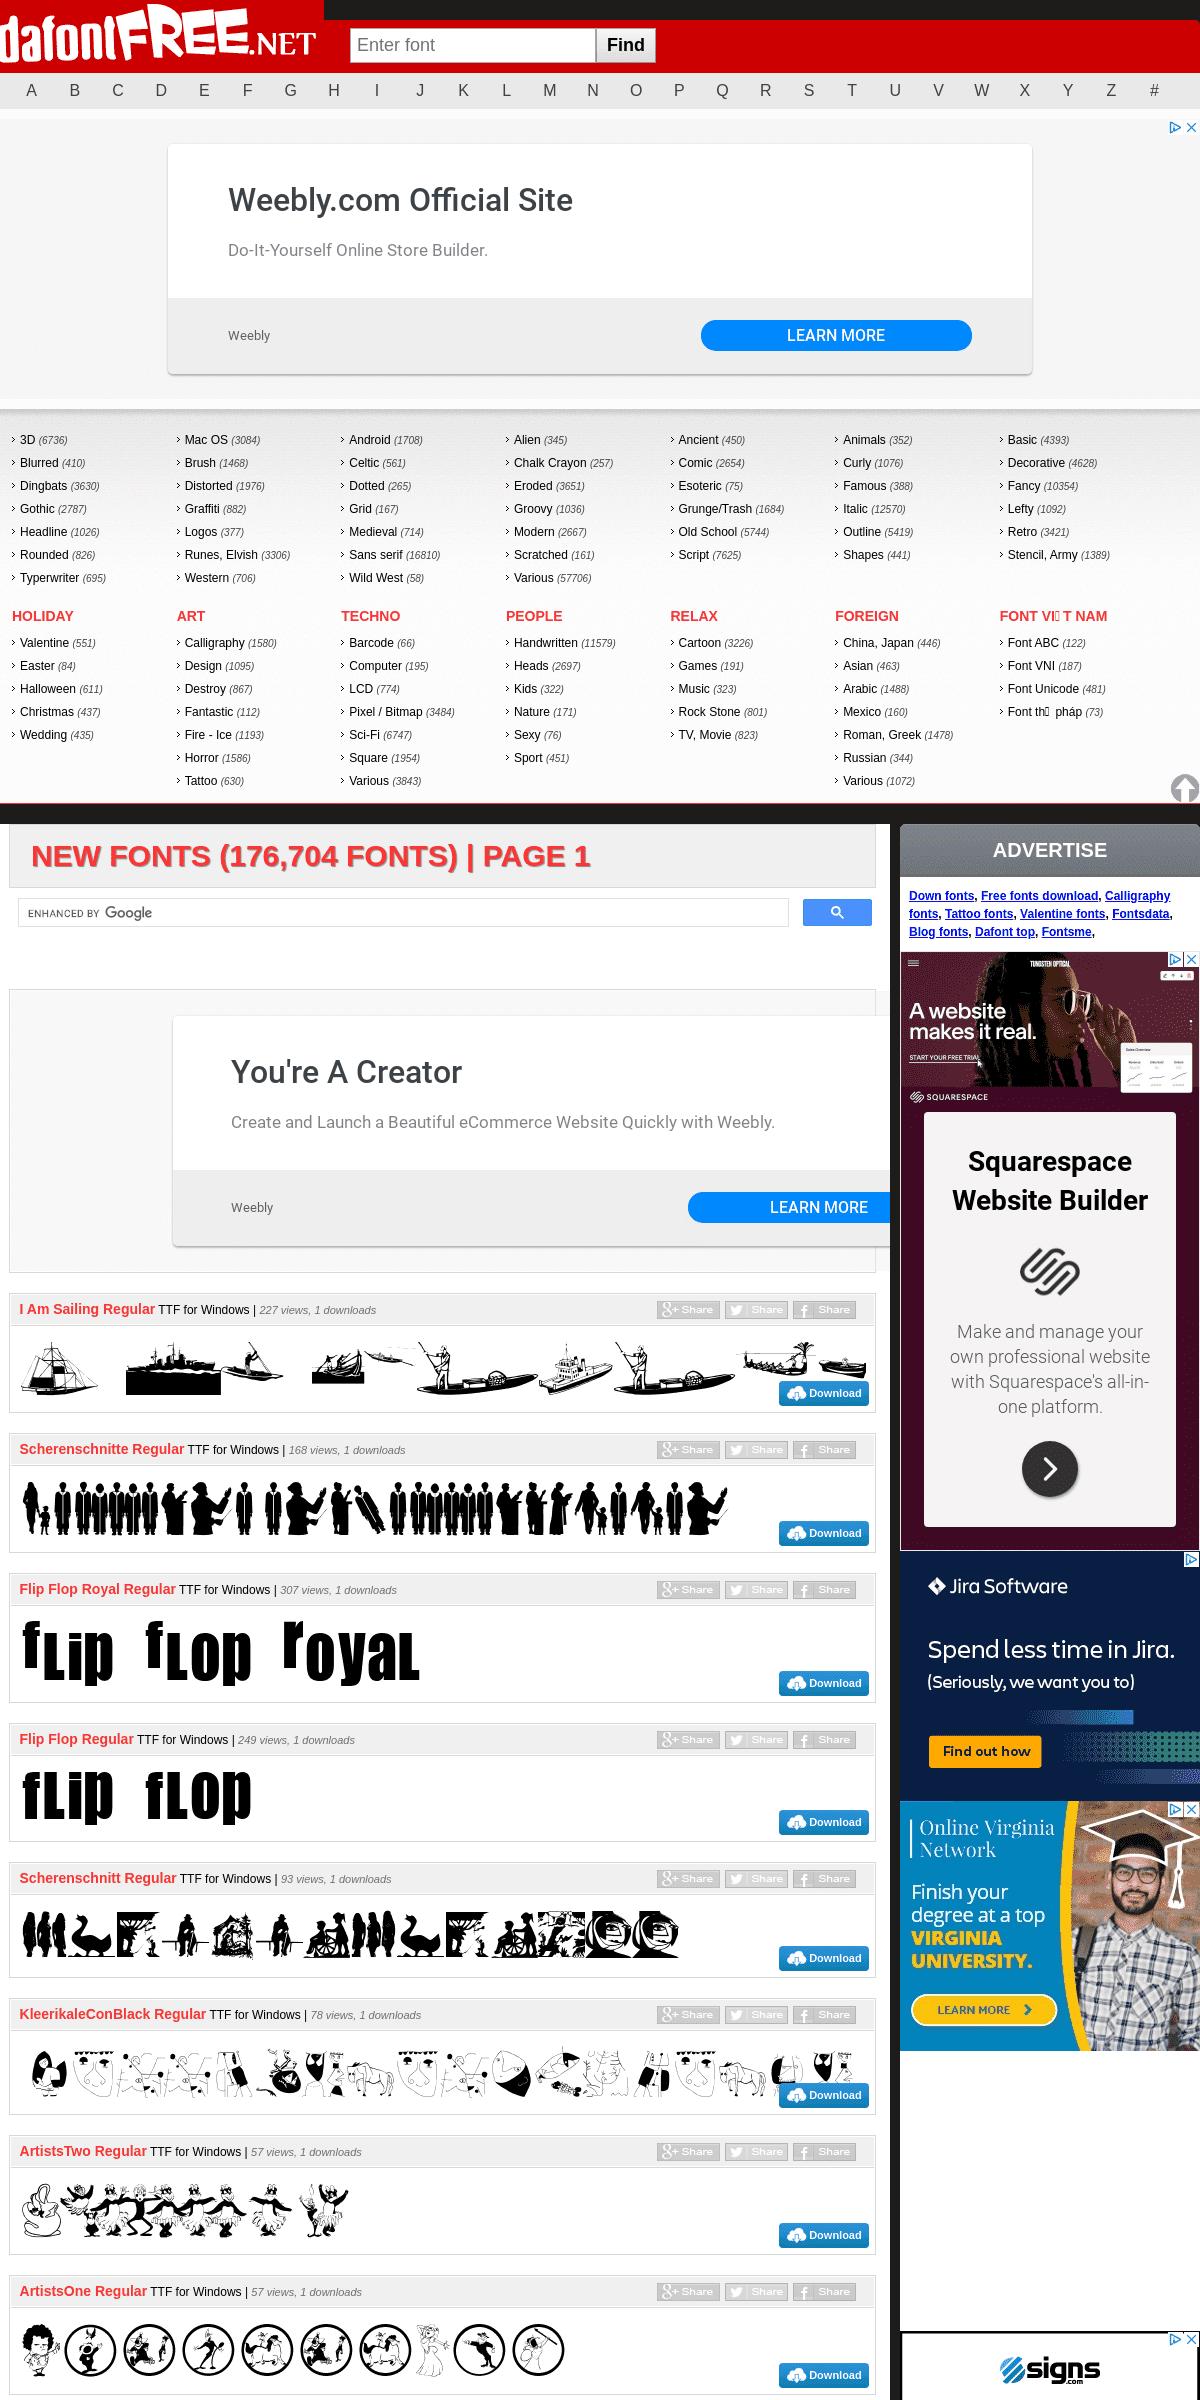 Dafont Free - Download fonts